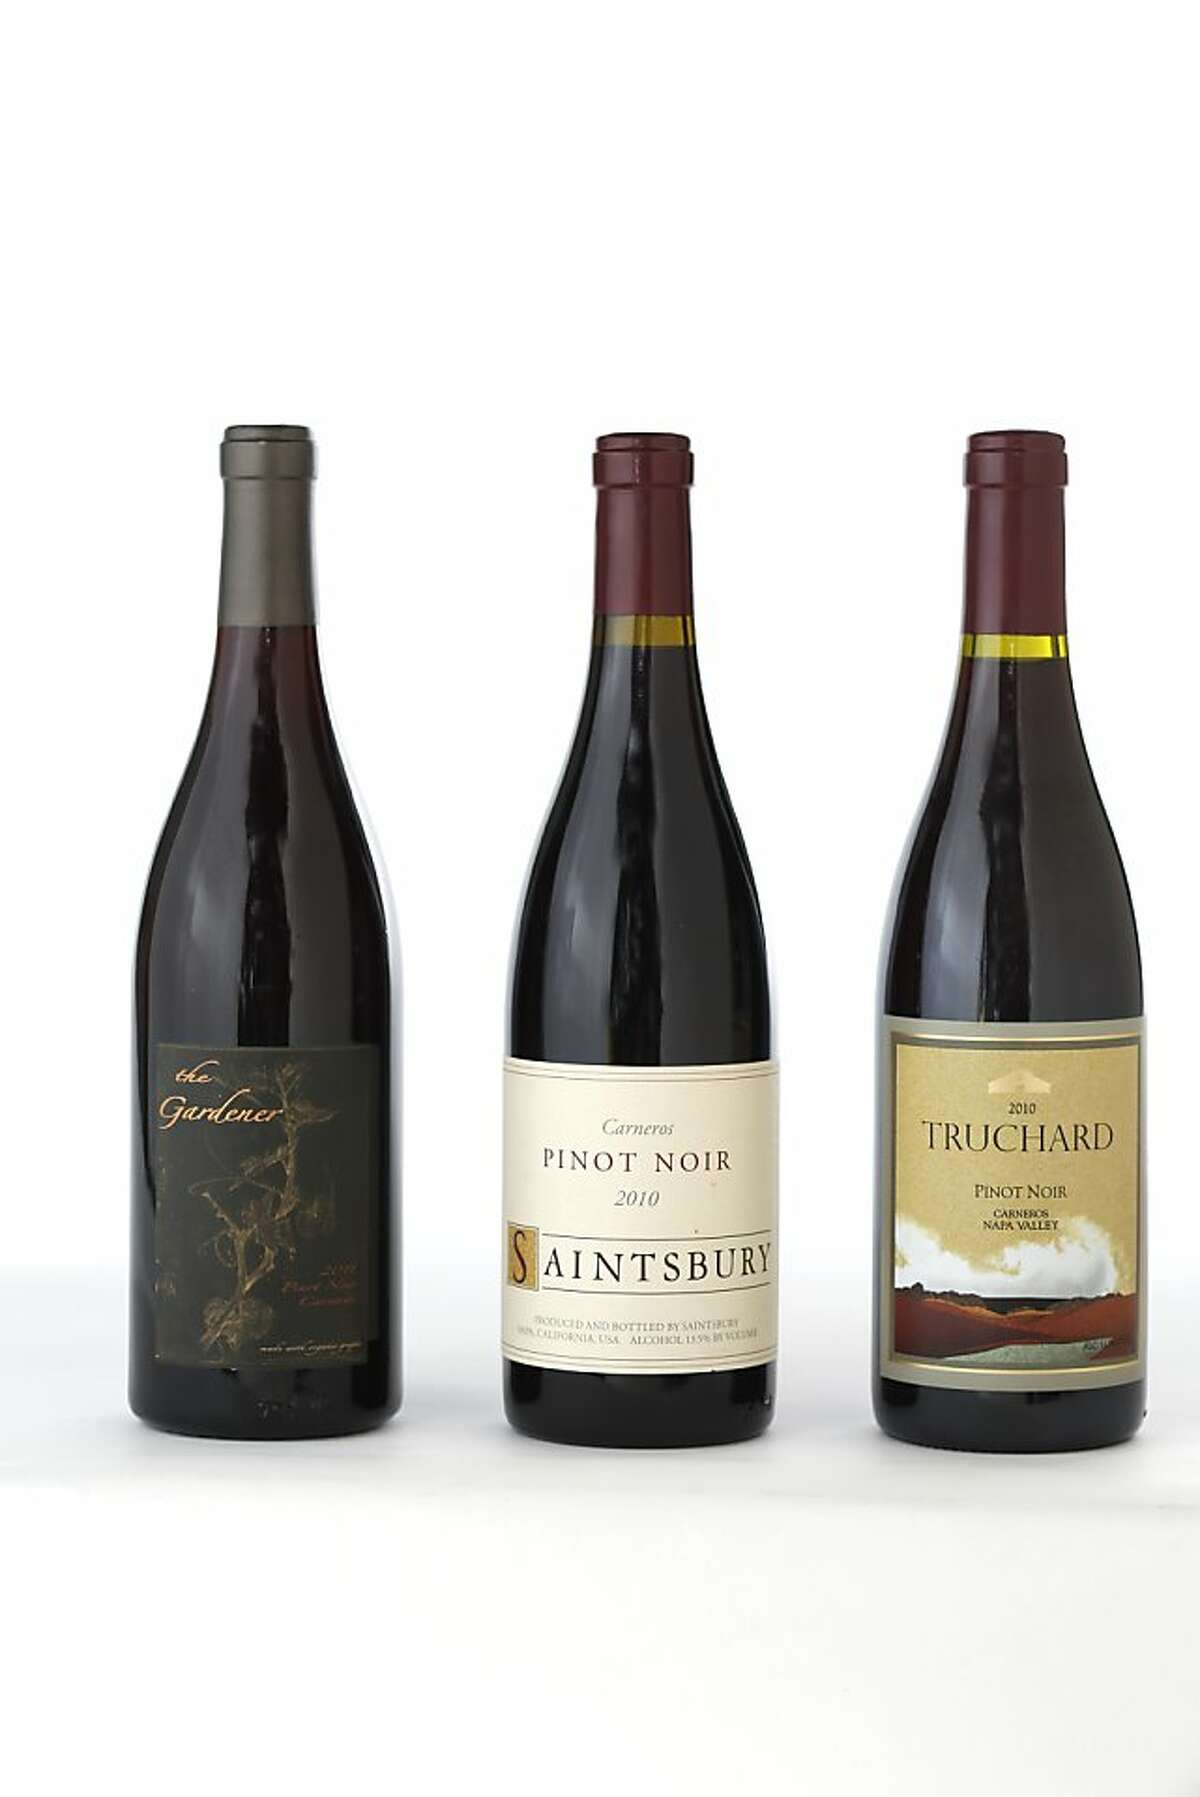 Three bottles of Carneros Pinot Noir left-right: 2011 The Gardner, 2010 Saintsbury, 2010 Truchard.